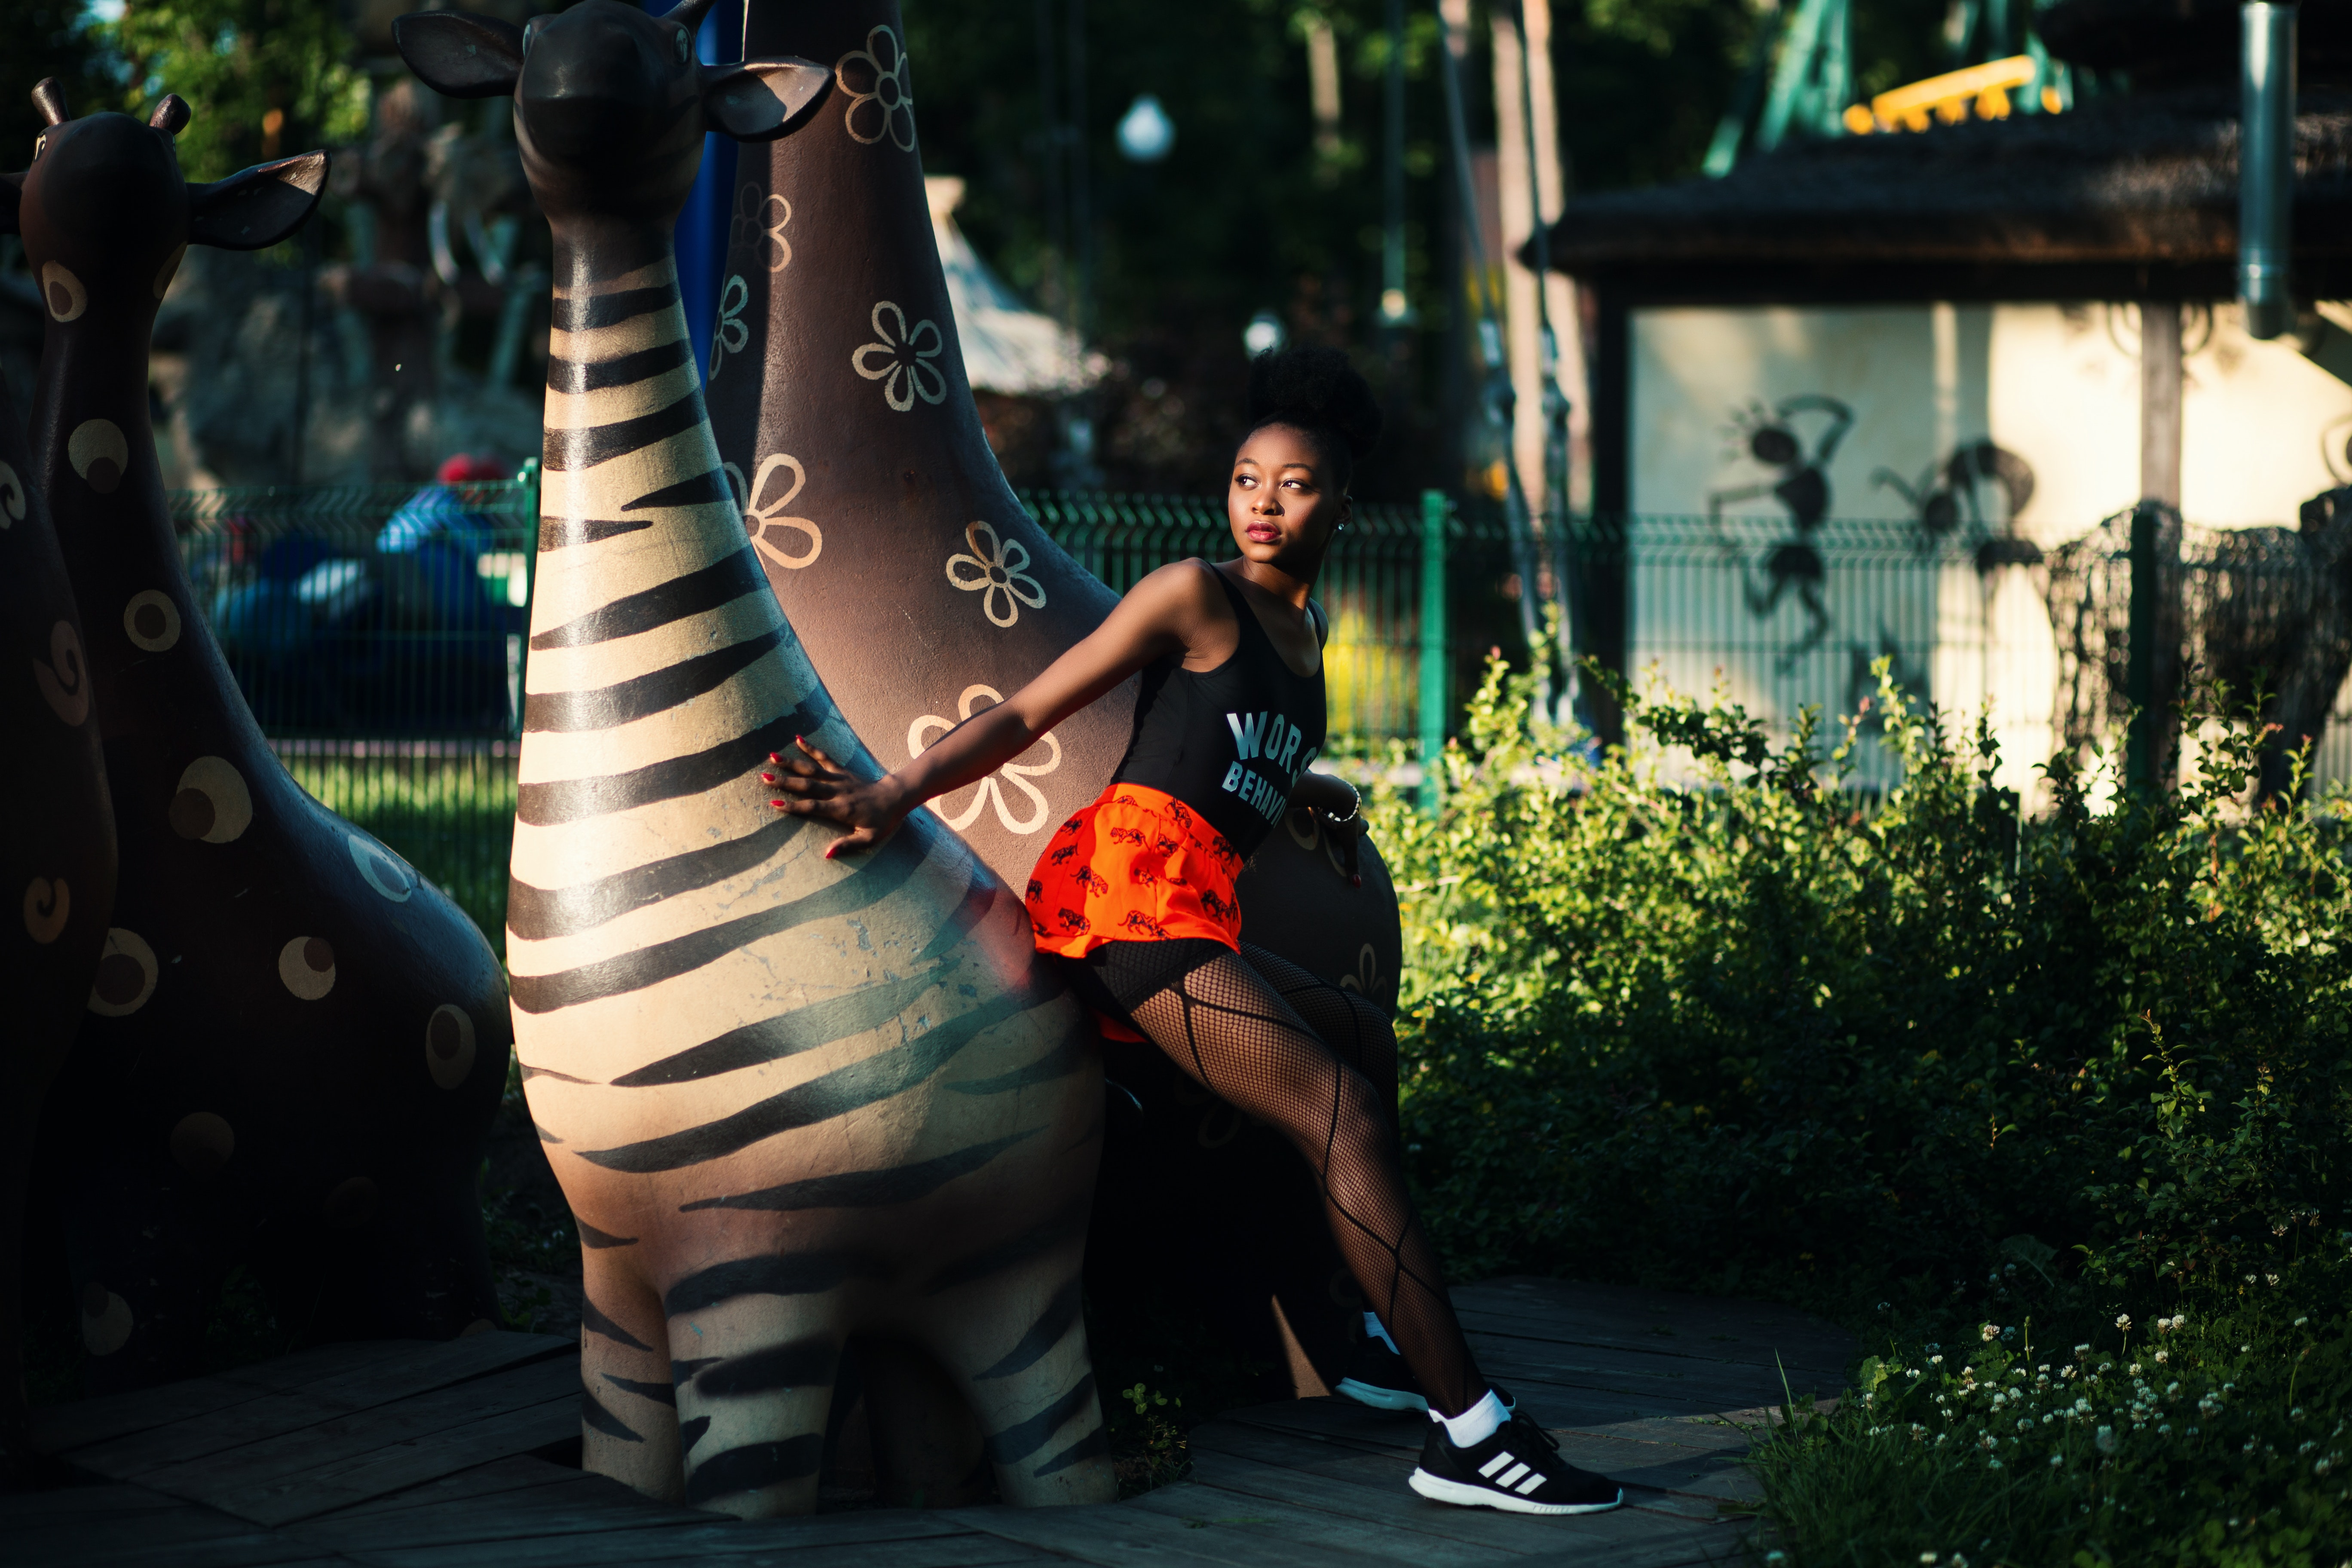 Photo of Woman Beside Zebra Statue, Recreation, Nature, Outdoors, Park, HQ Photo